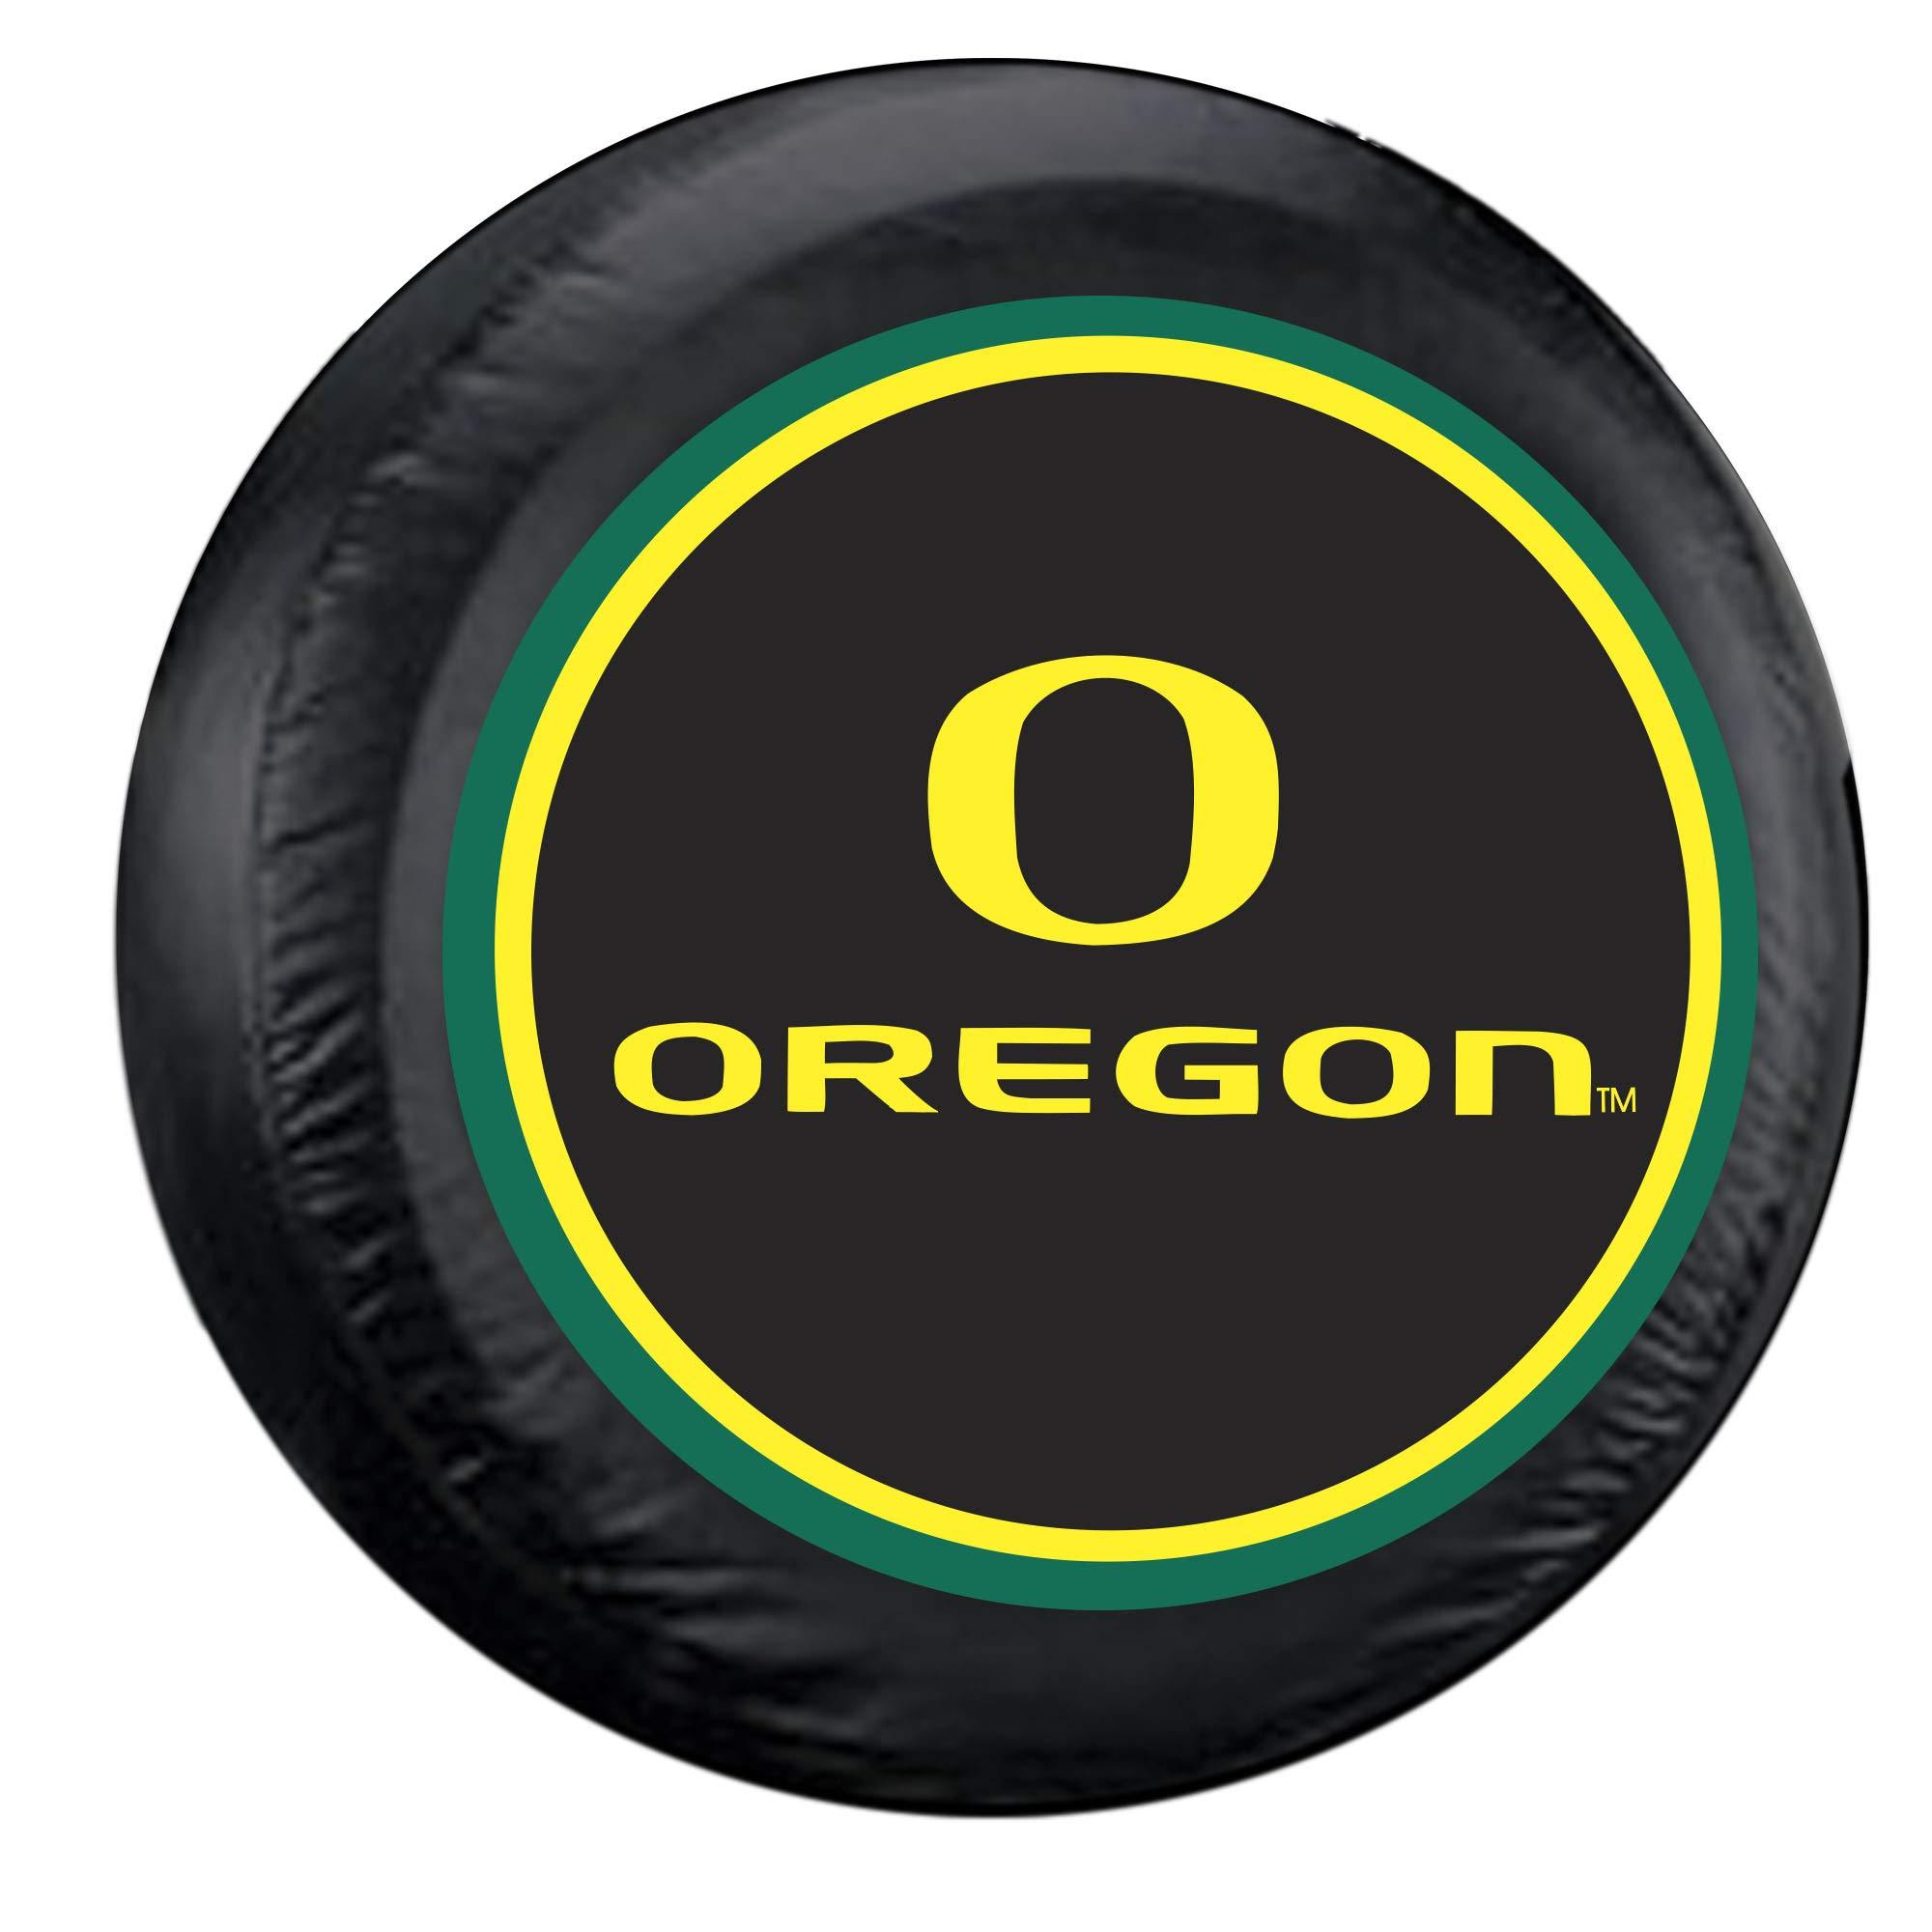 Fremont Die NCAA Oregon Ducks Tire Cover, Standard Size (27-29'' Diameter)